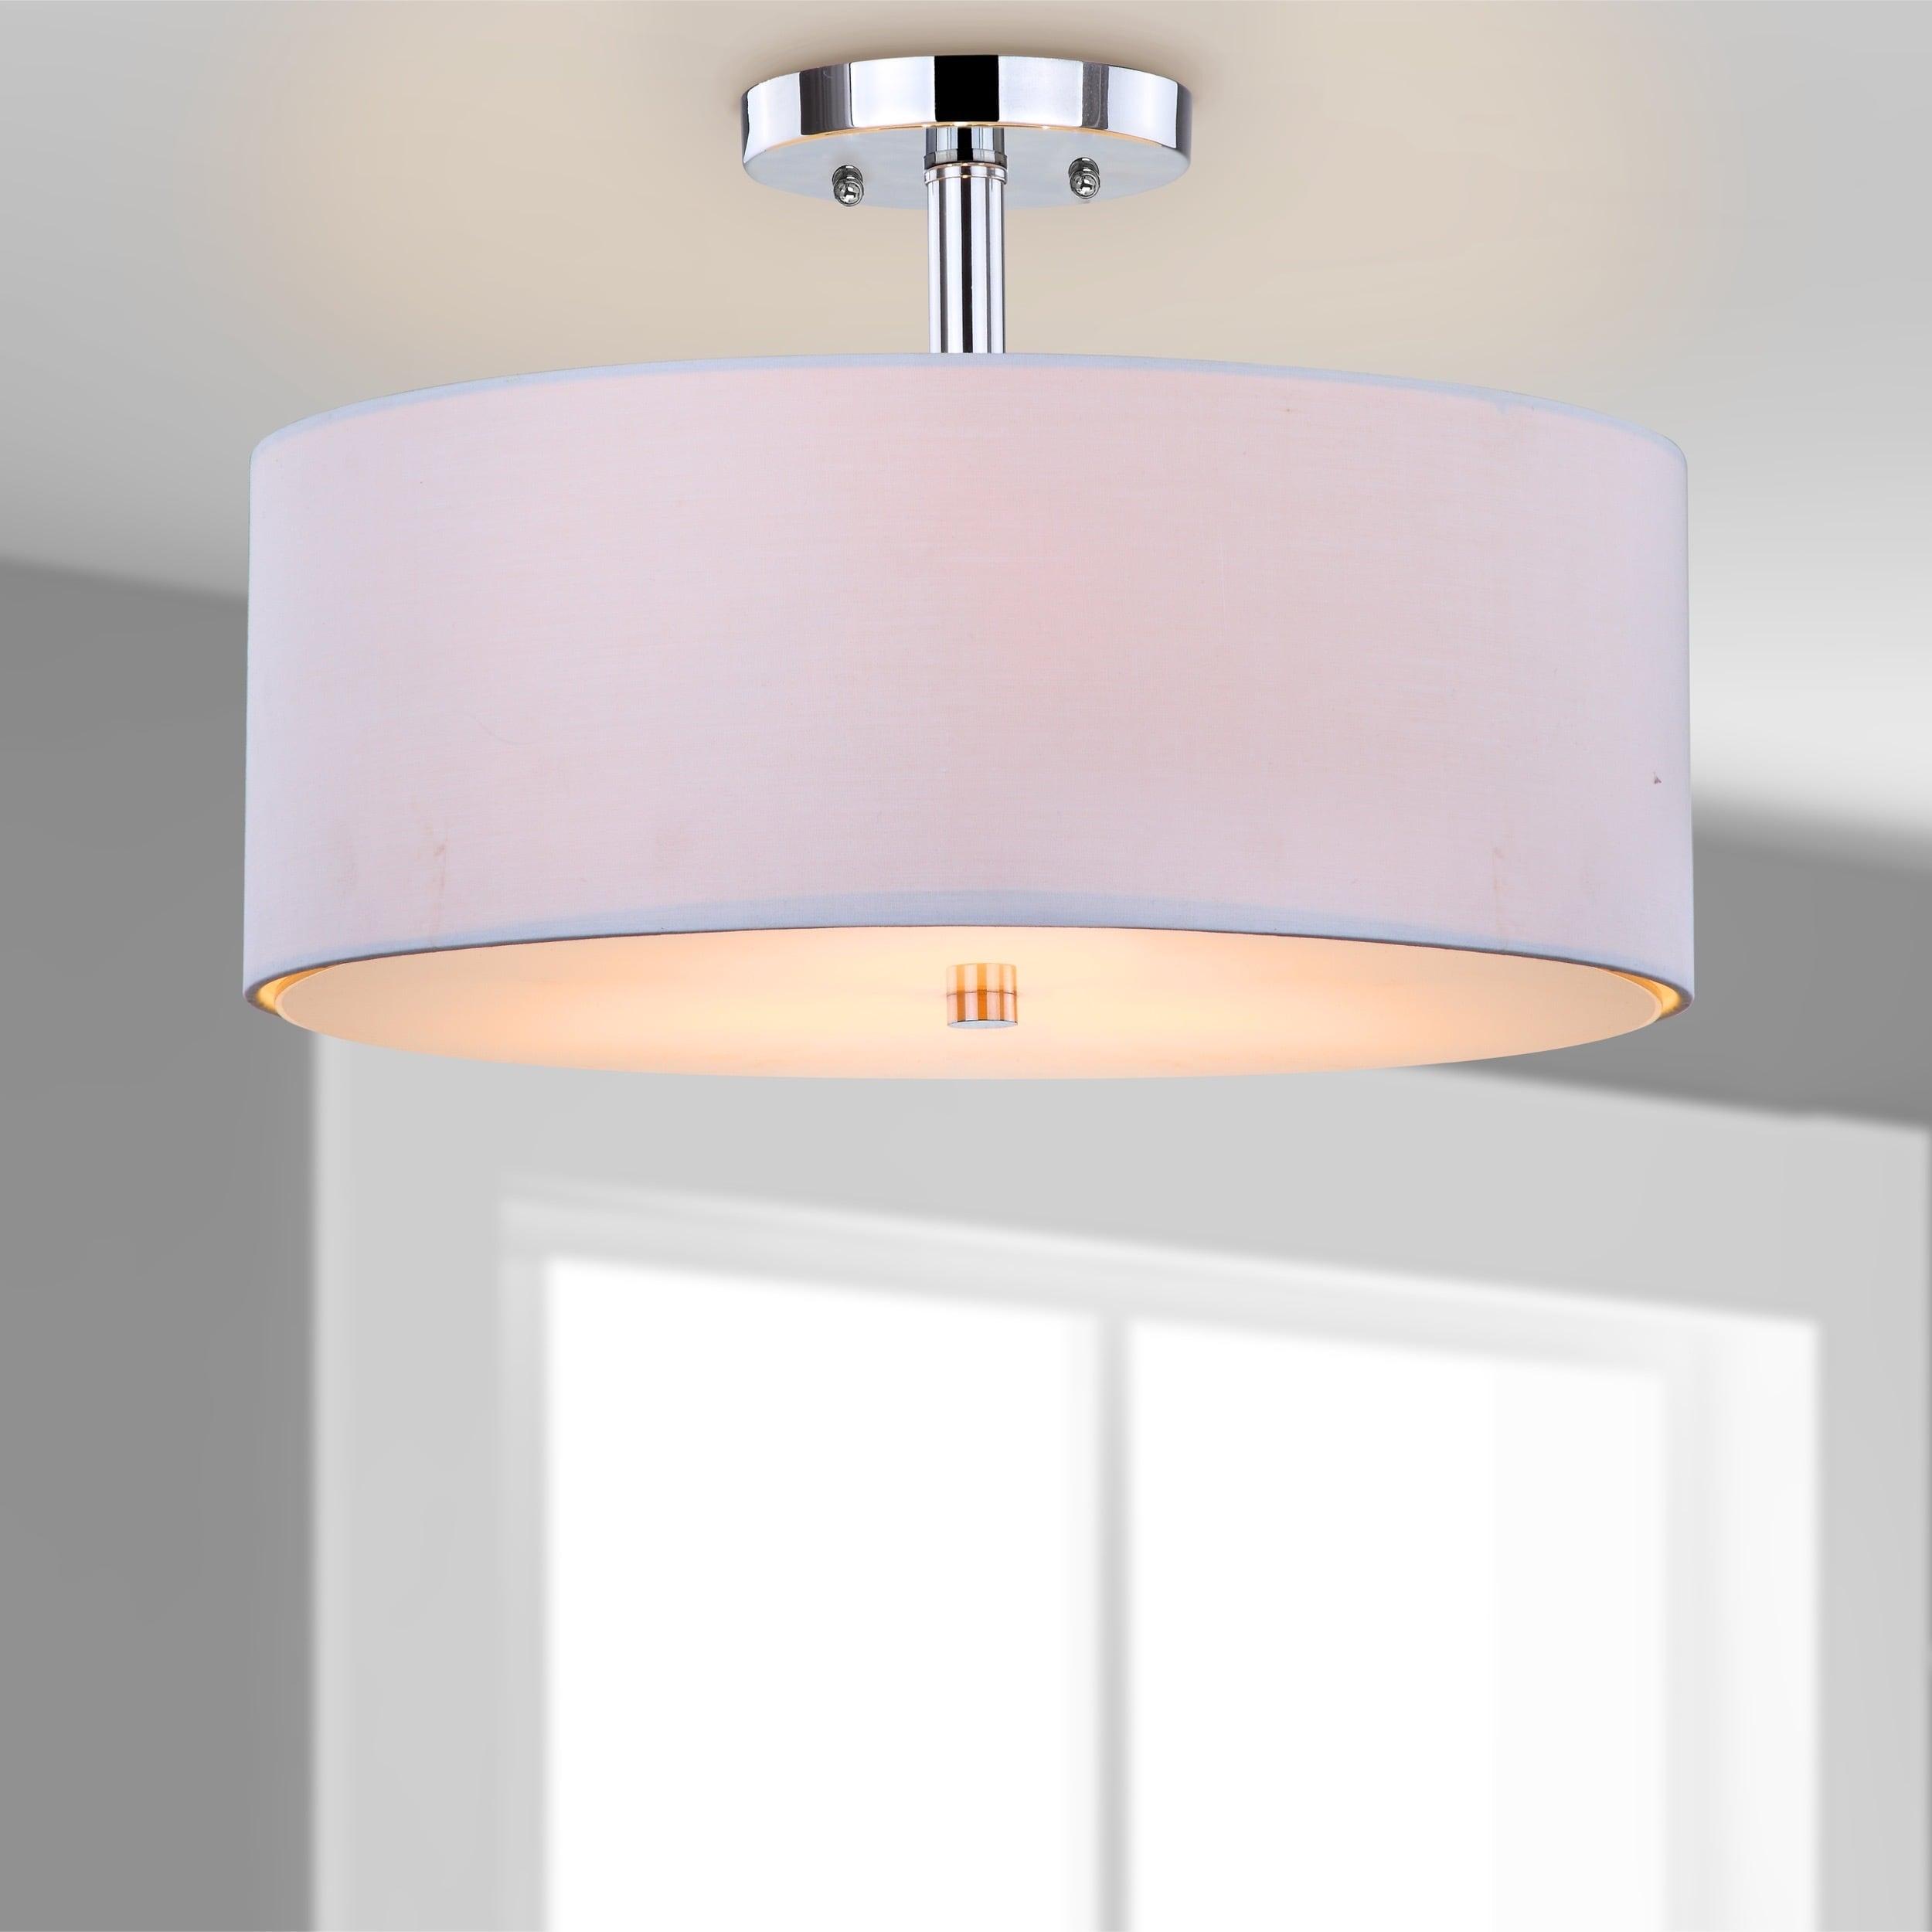 Safavieh Lighting Clara 3 Light Chrome Ceiling Drum